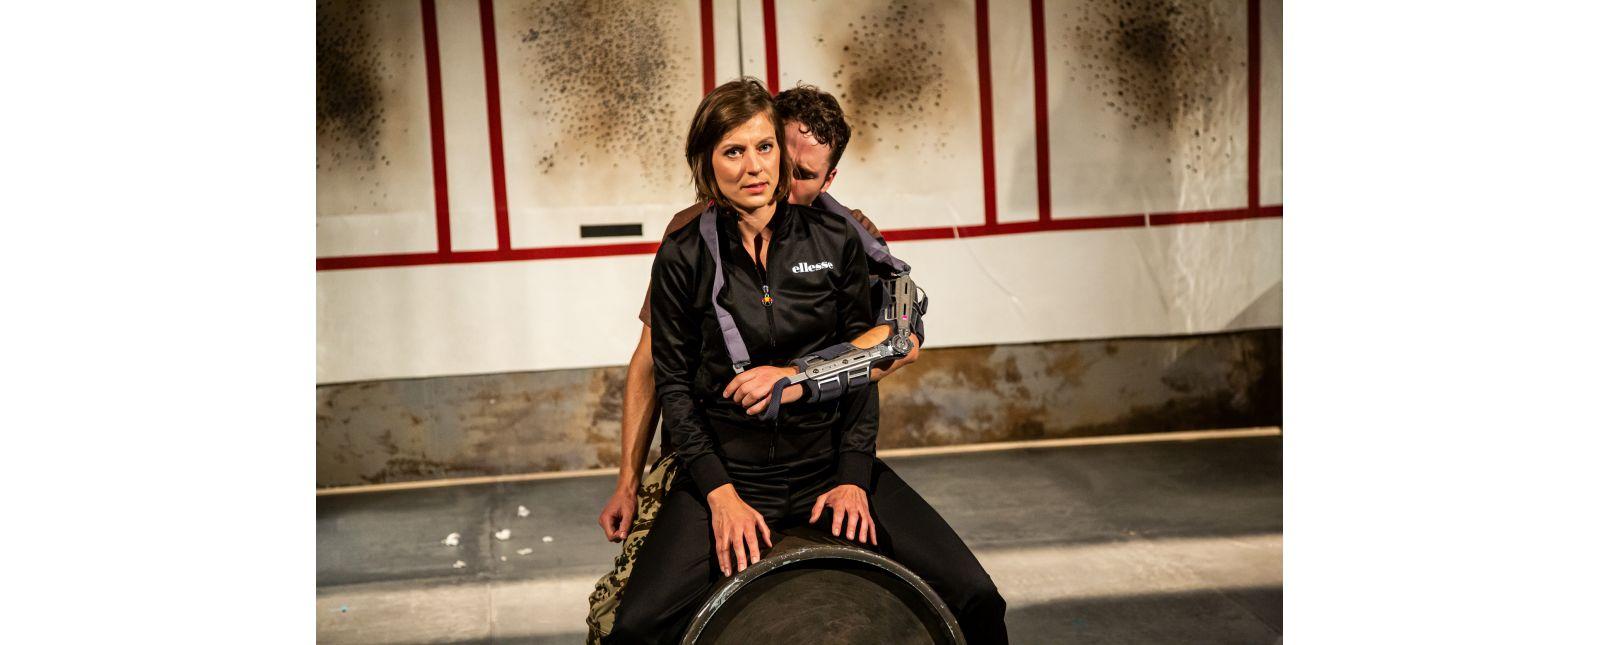 HANNIBAL // Stefanie Mrachacz / Moritz Peschke // Foto: Laura Nickel